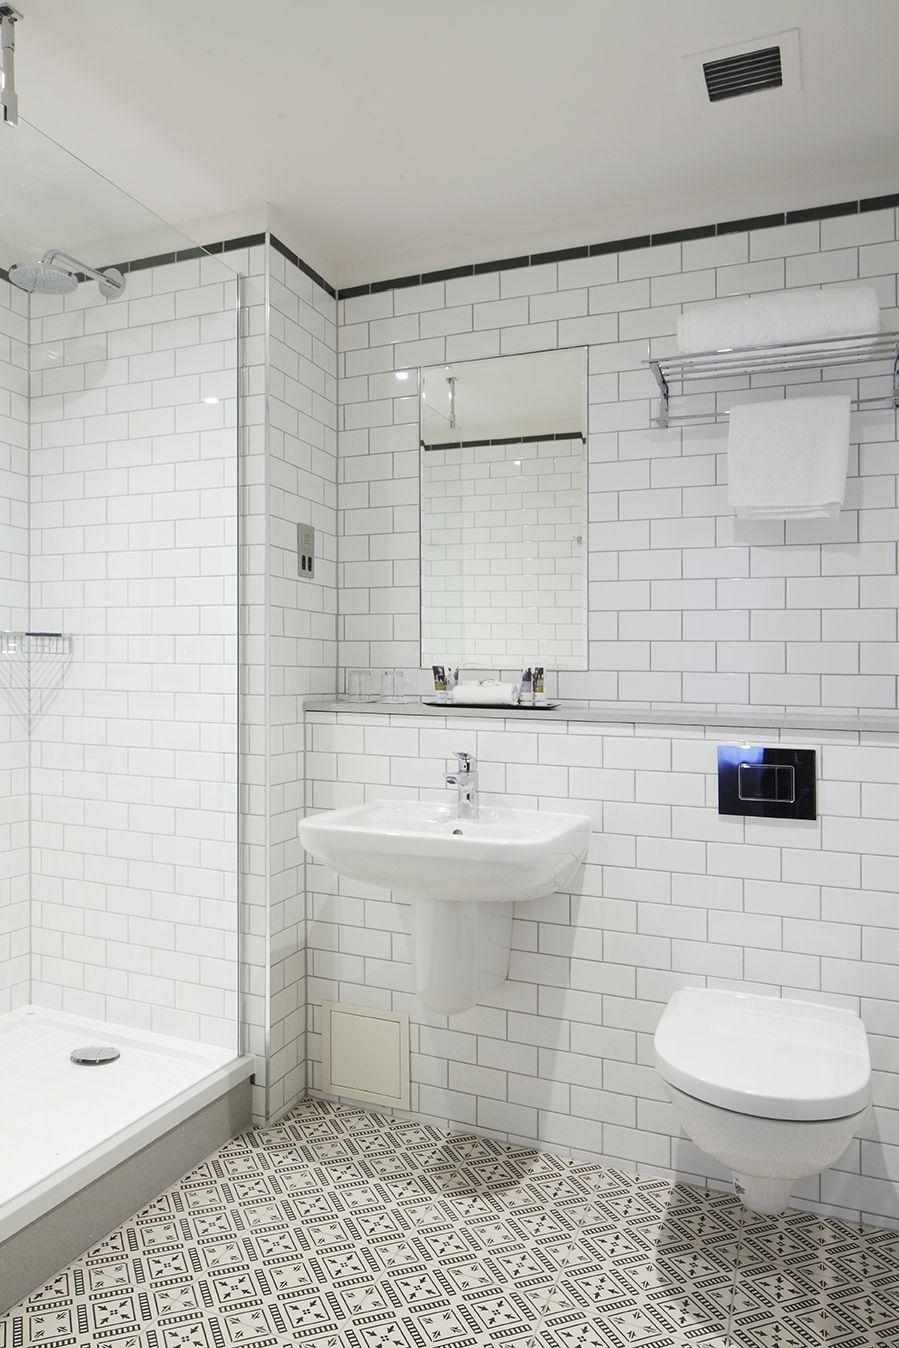 Mercure Bristol Grand Hotel | Guestroom Bathroom | Central Design ...